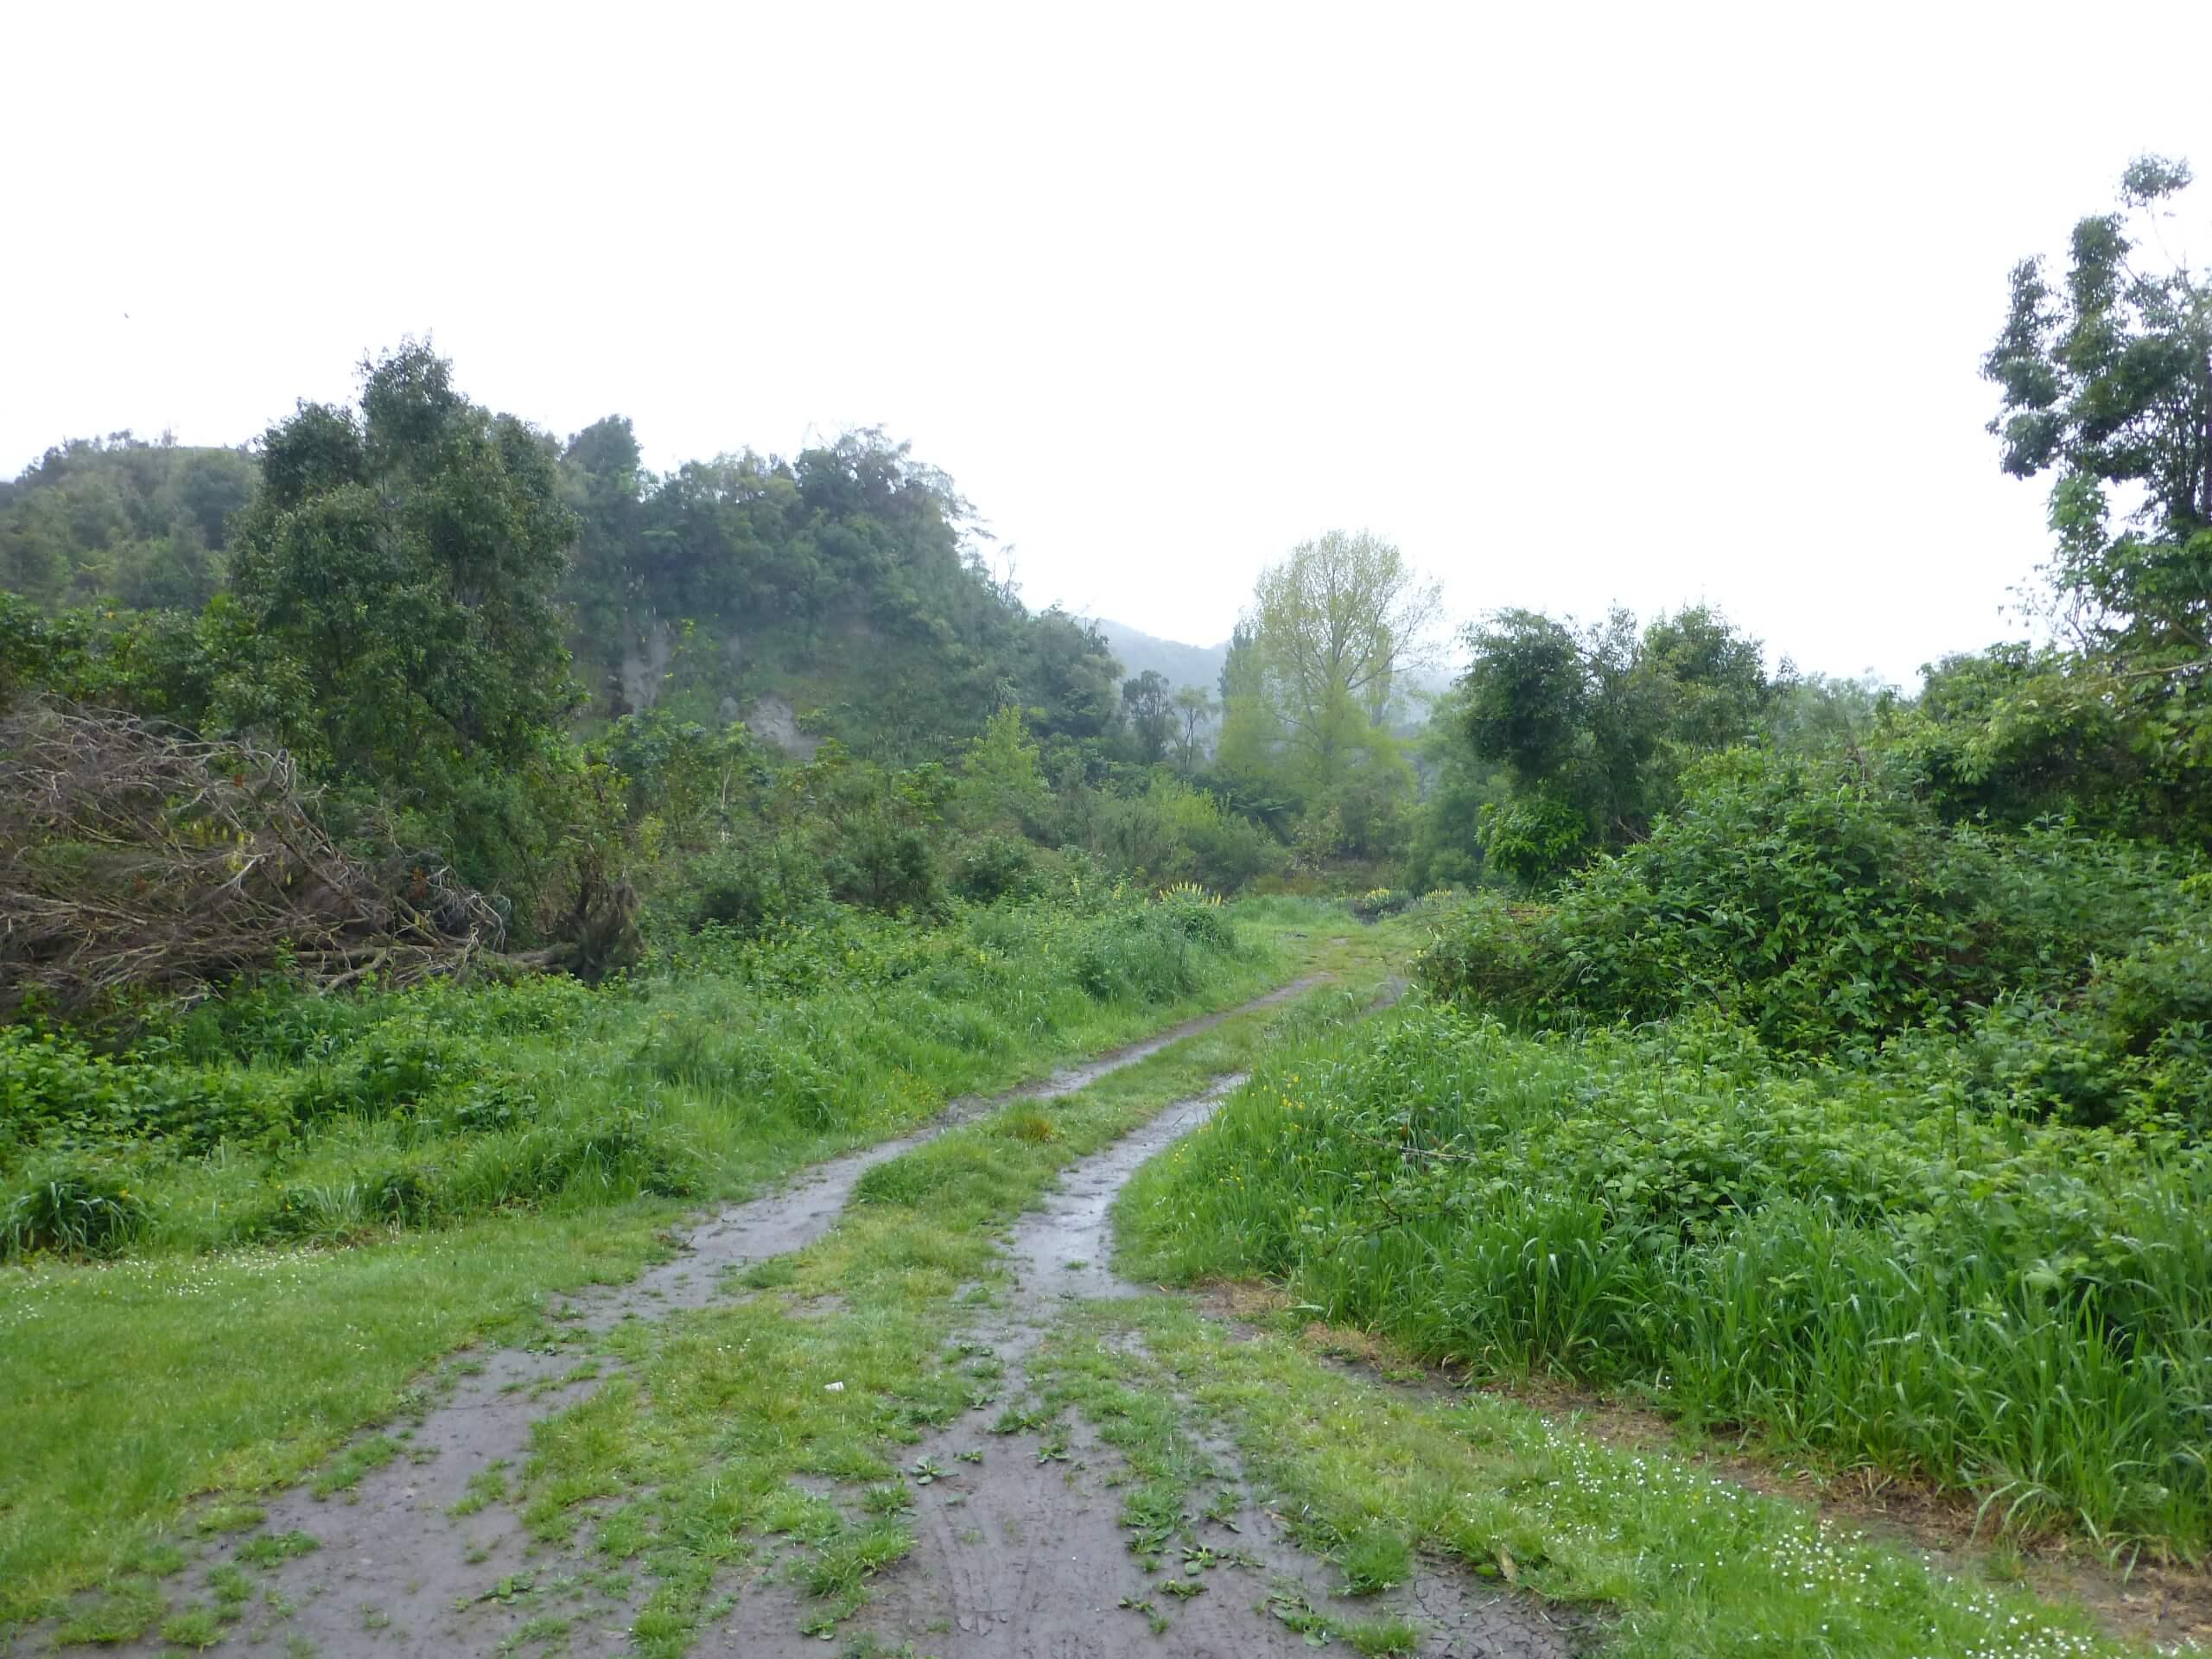 Campingplatz, PiriPiri 1, Weit weg reisen